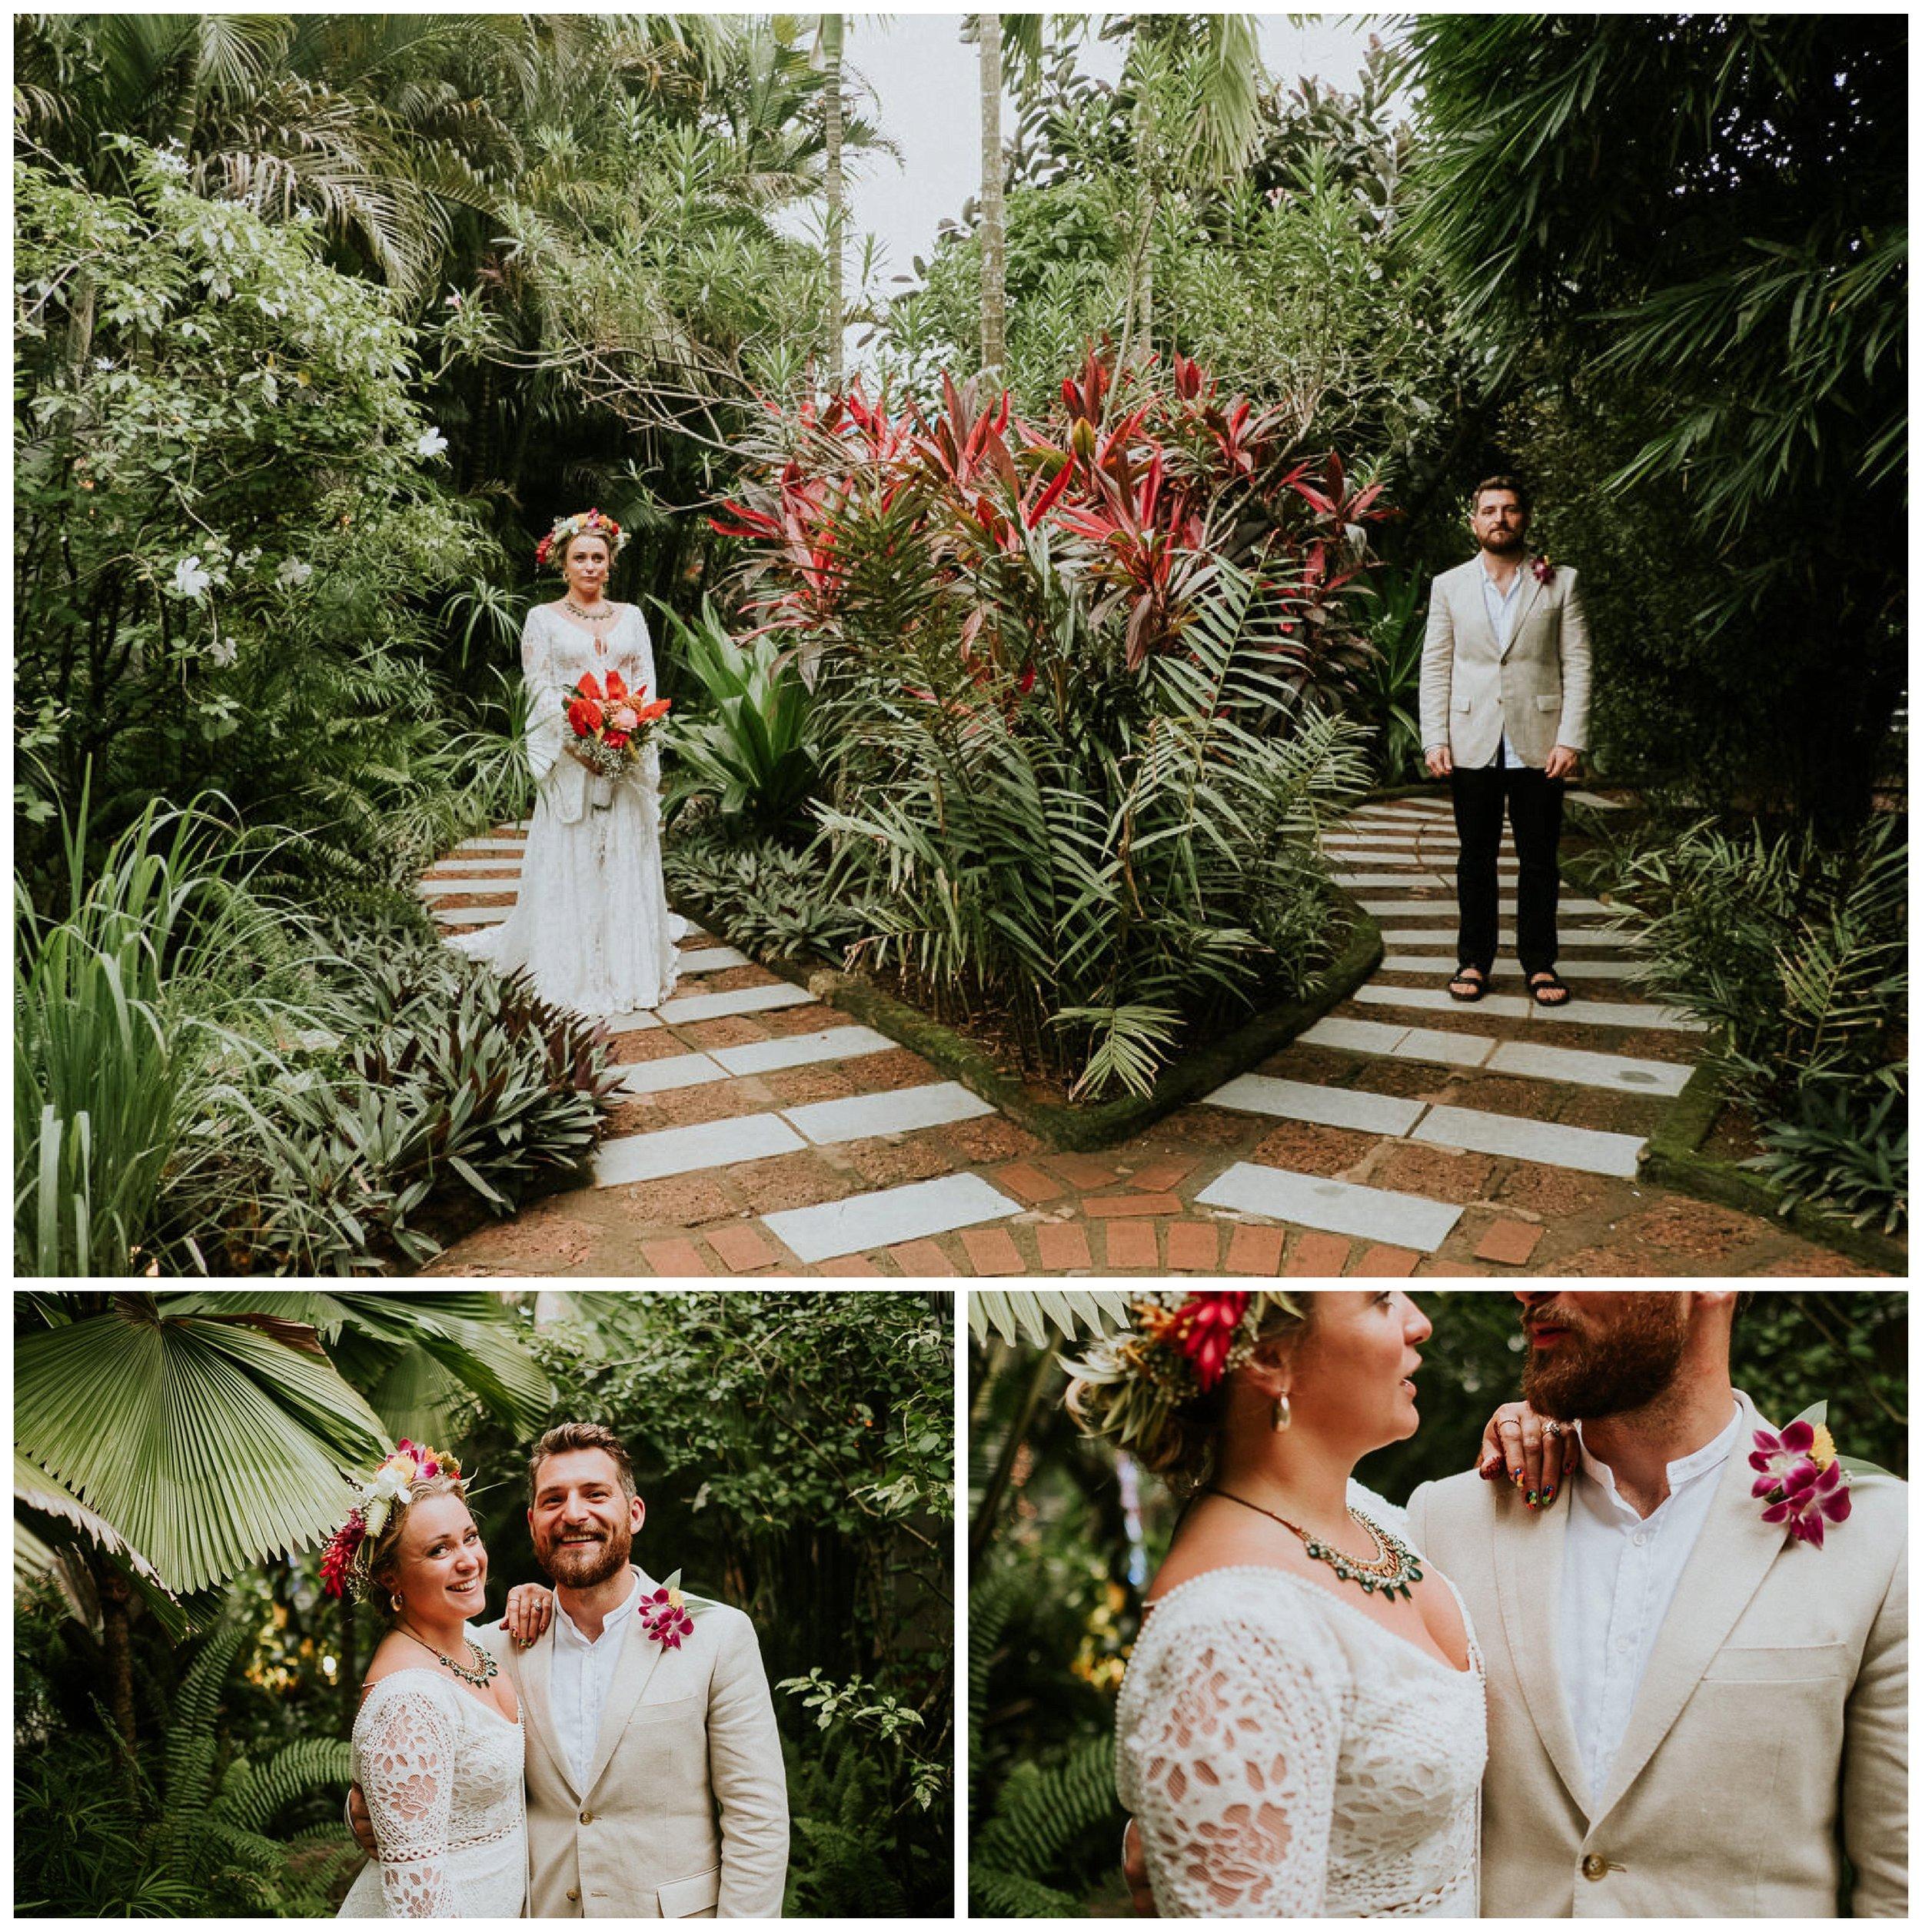 Goa Destination Wedding Photographer India Colouful Fun Joanna Nicole Photography Coco Shambhala19.jpg